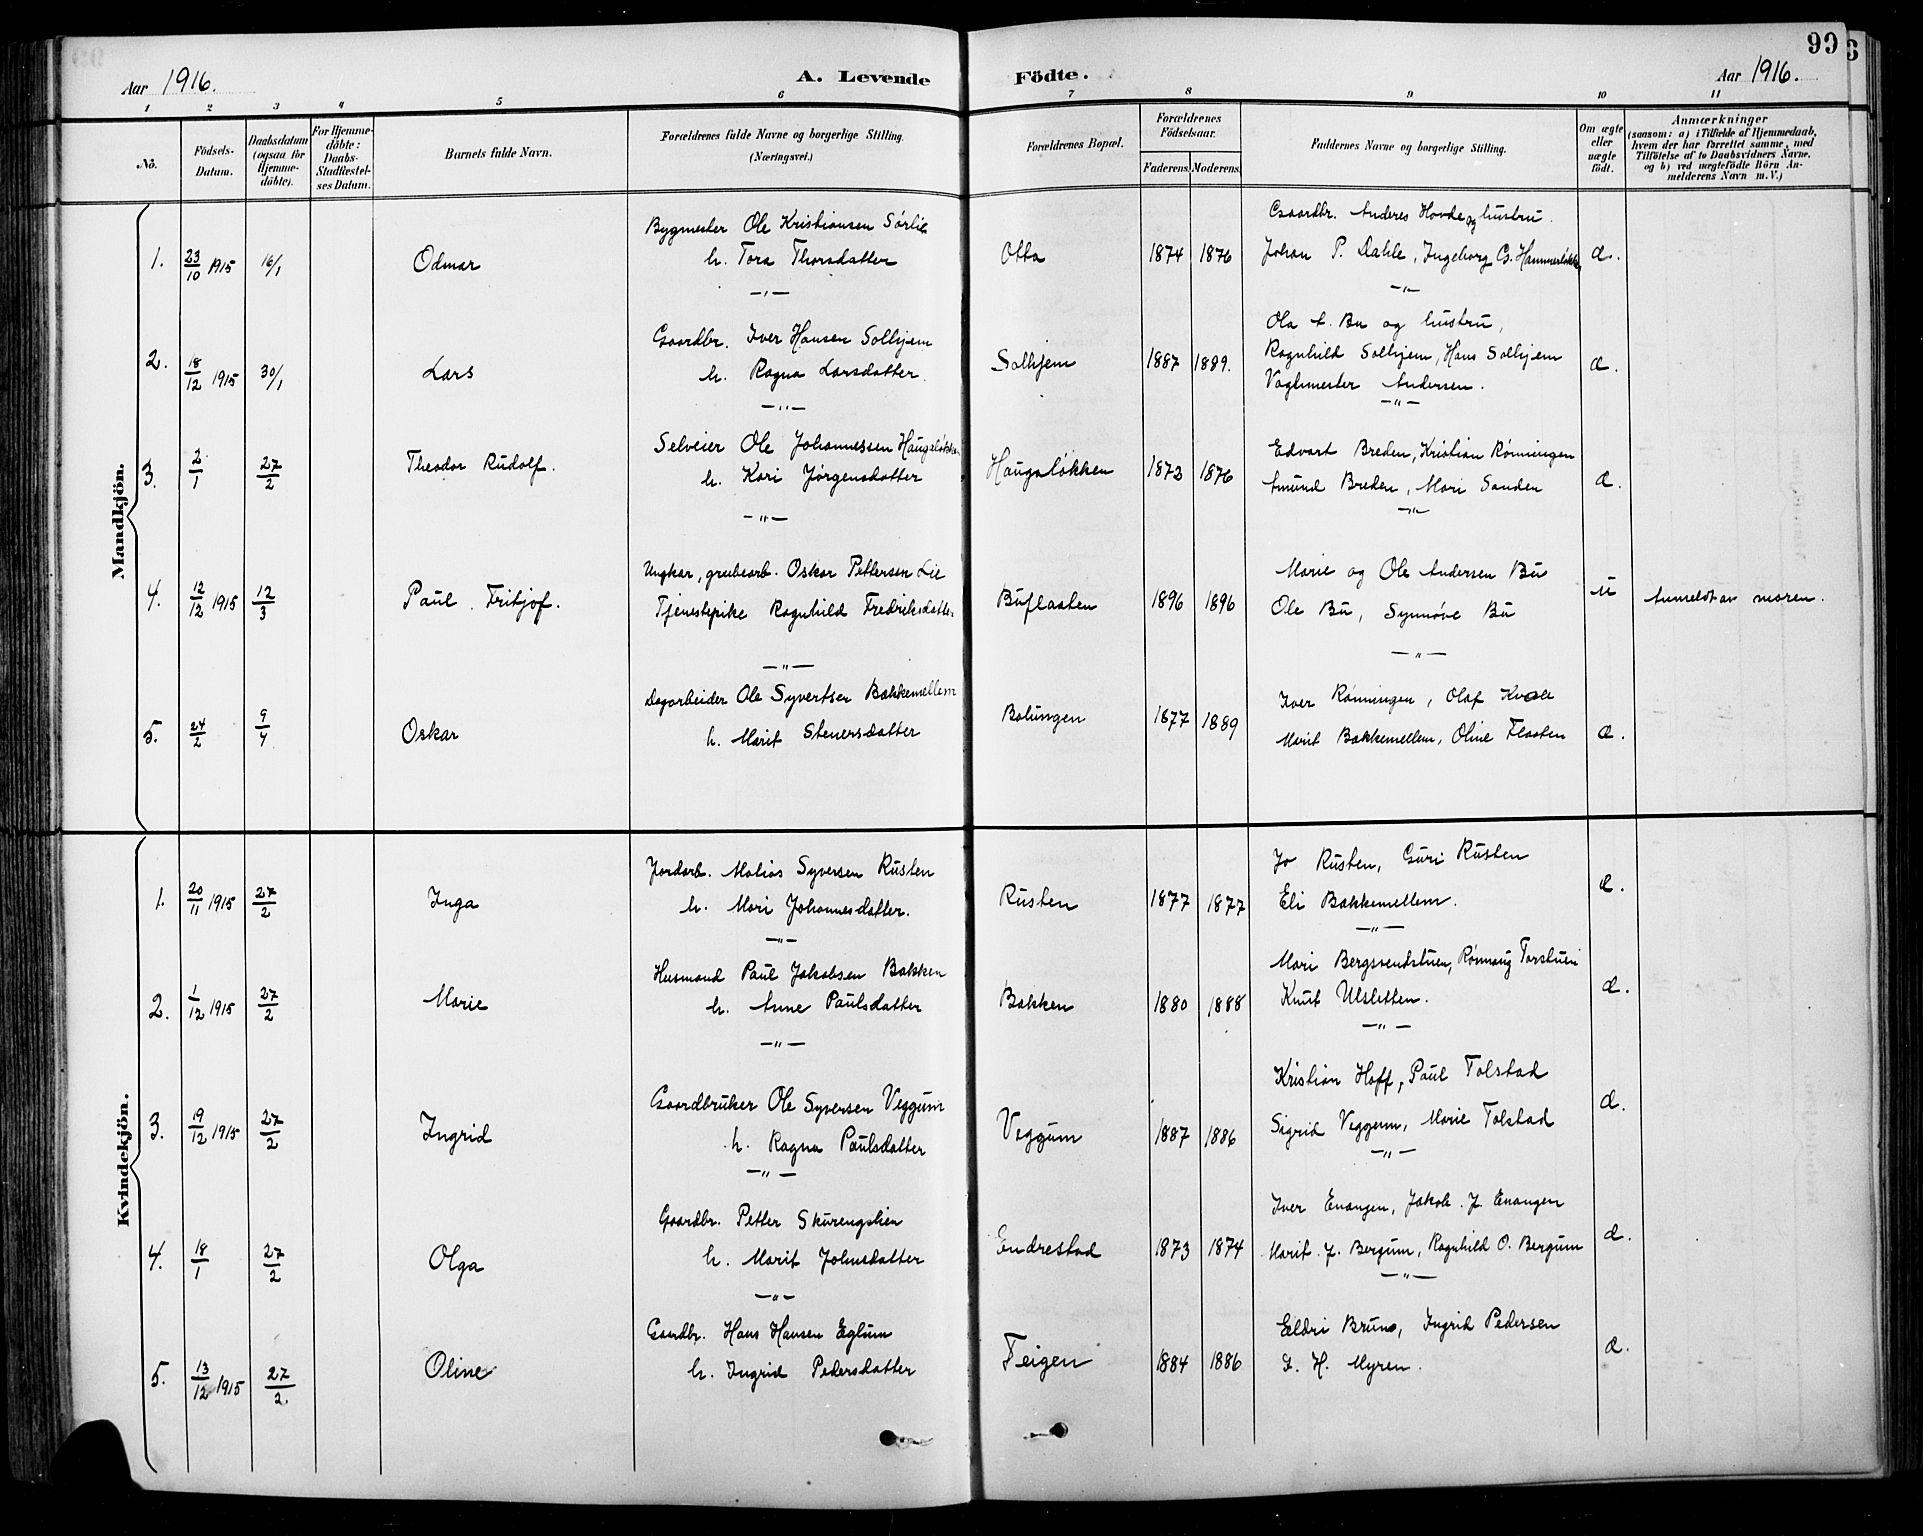 SAH, Sel prestekontor, Klokkerbok nr. 1, 1894-1923, s. 99